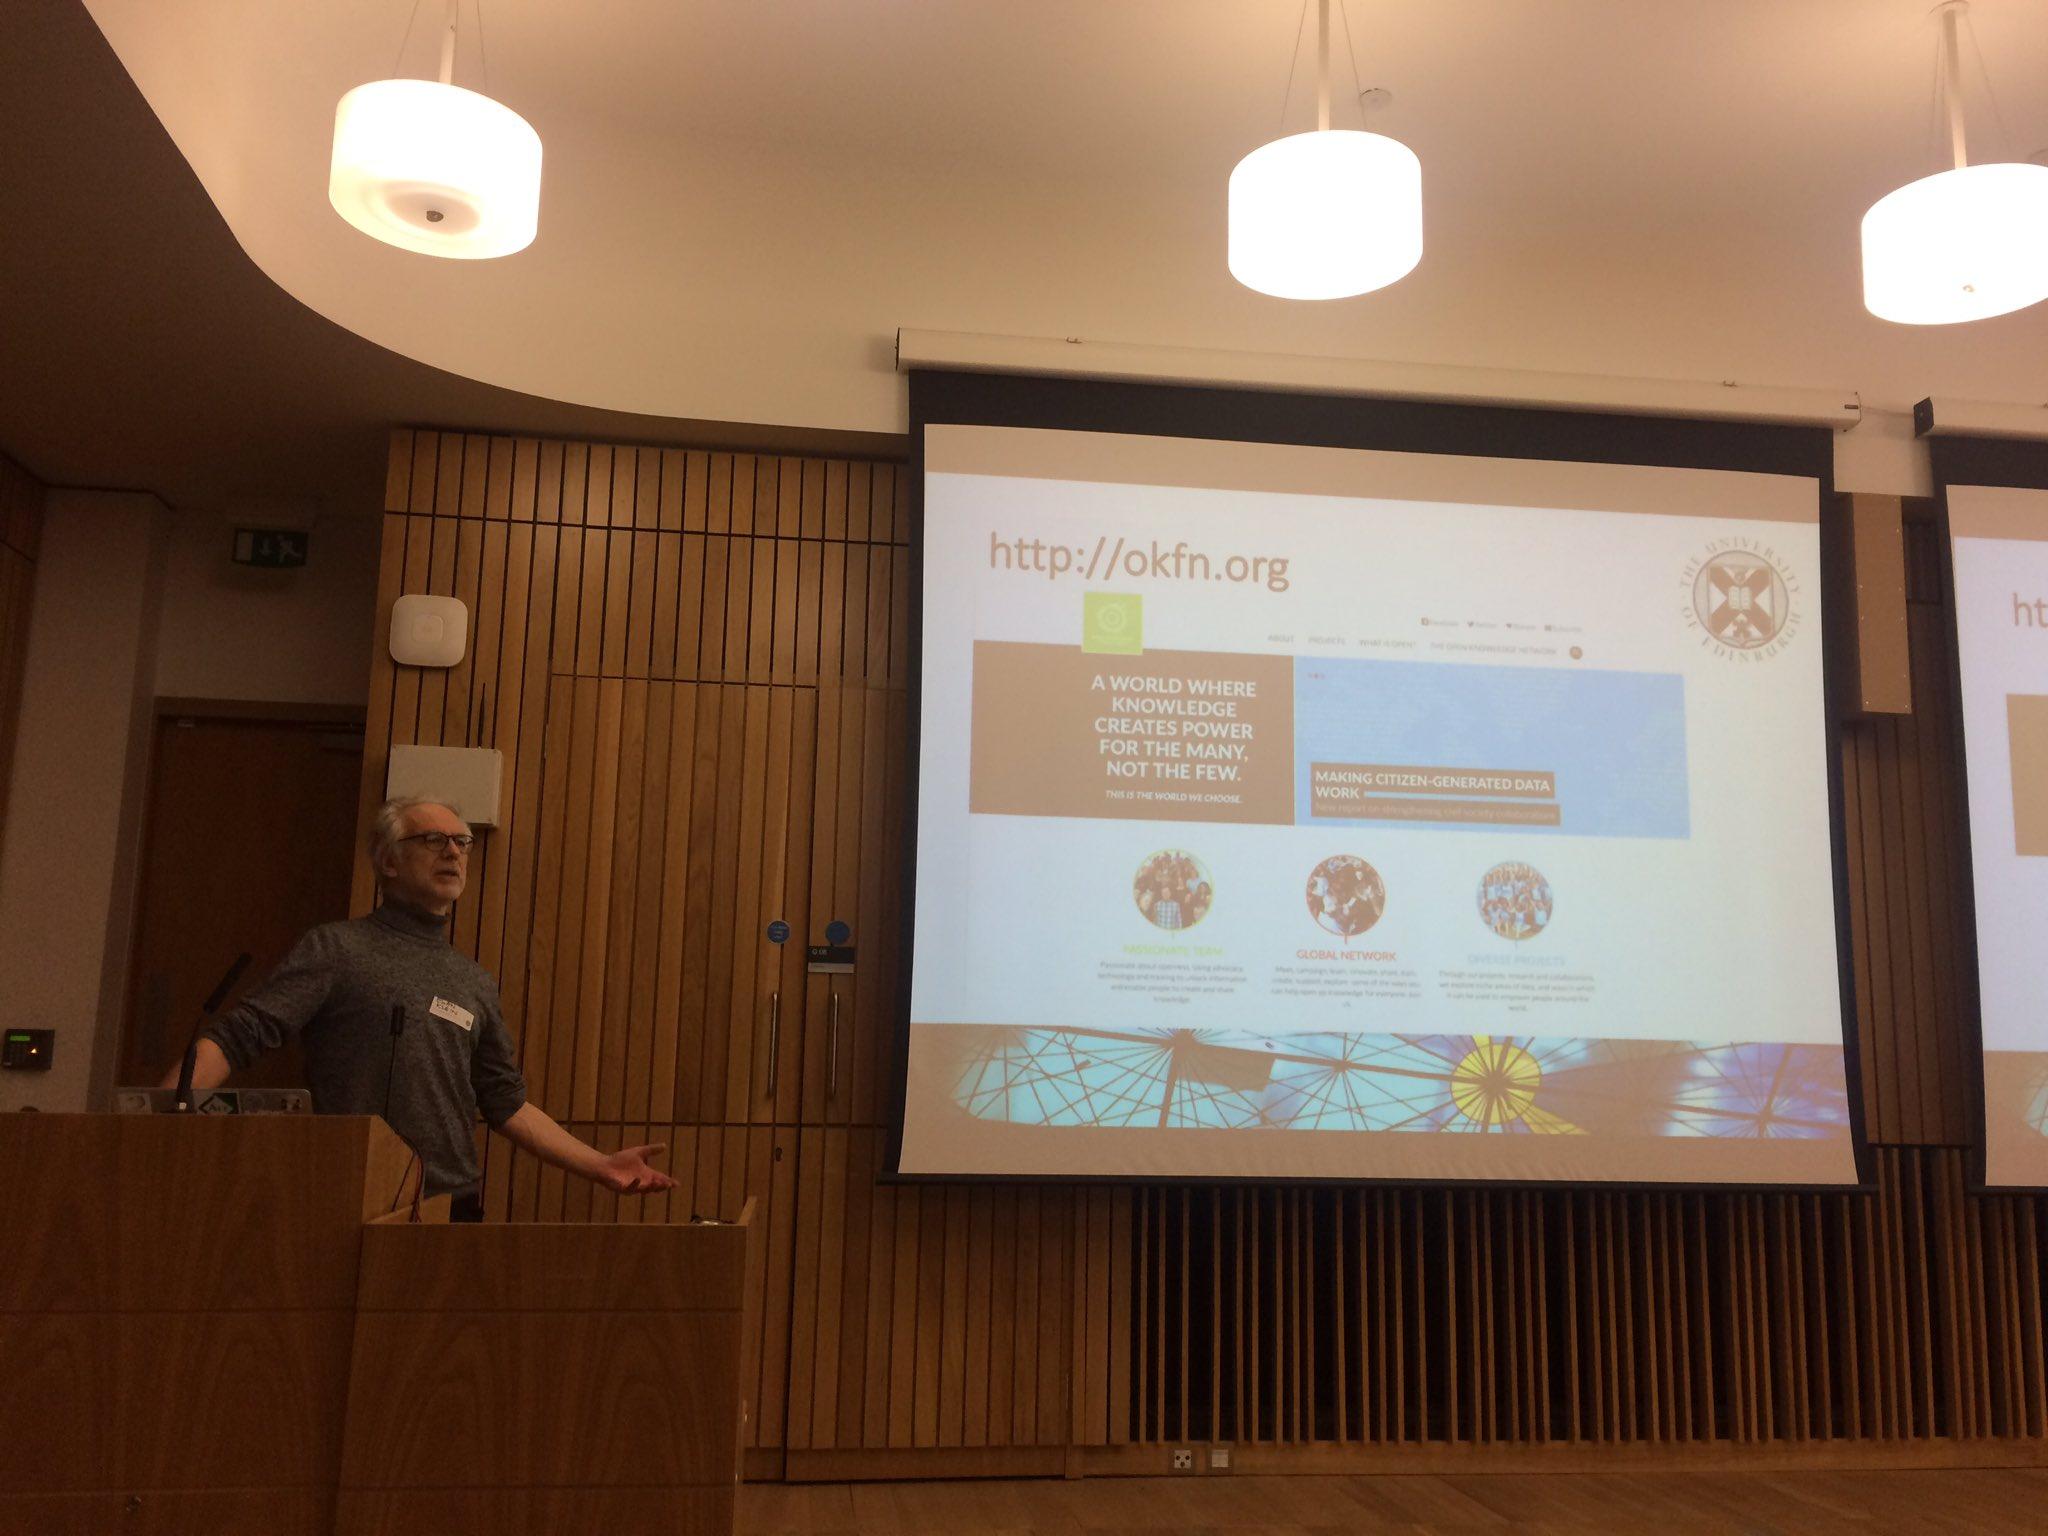 .@ewanhklein introduces the Open Knowledge Scotland @okfnscot network & events. #UoEOKN https://t.co/QcCdXgud17